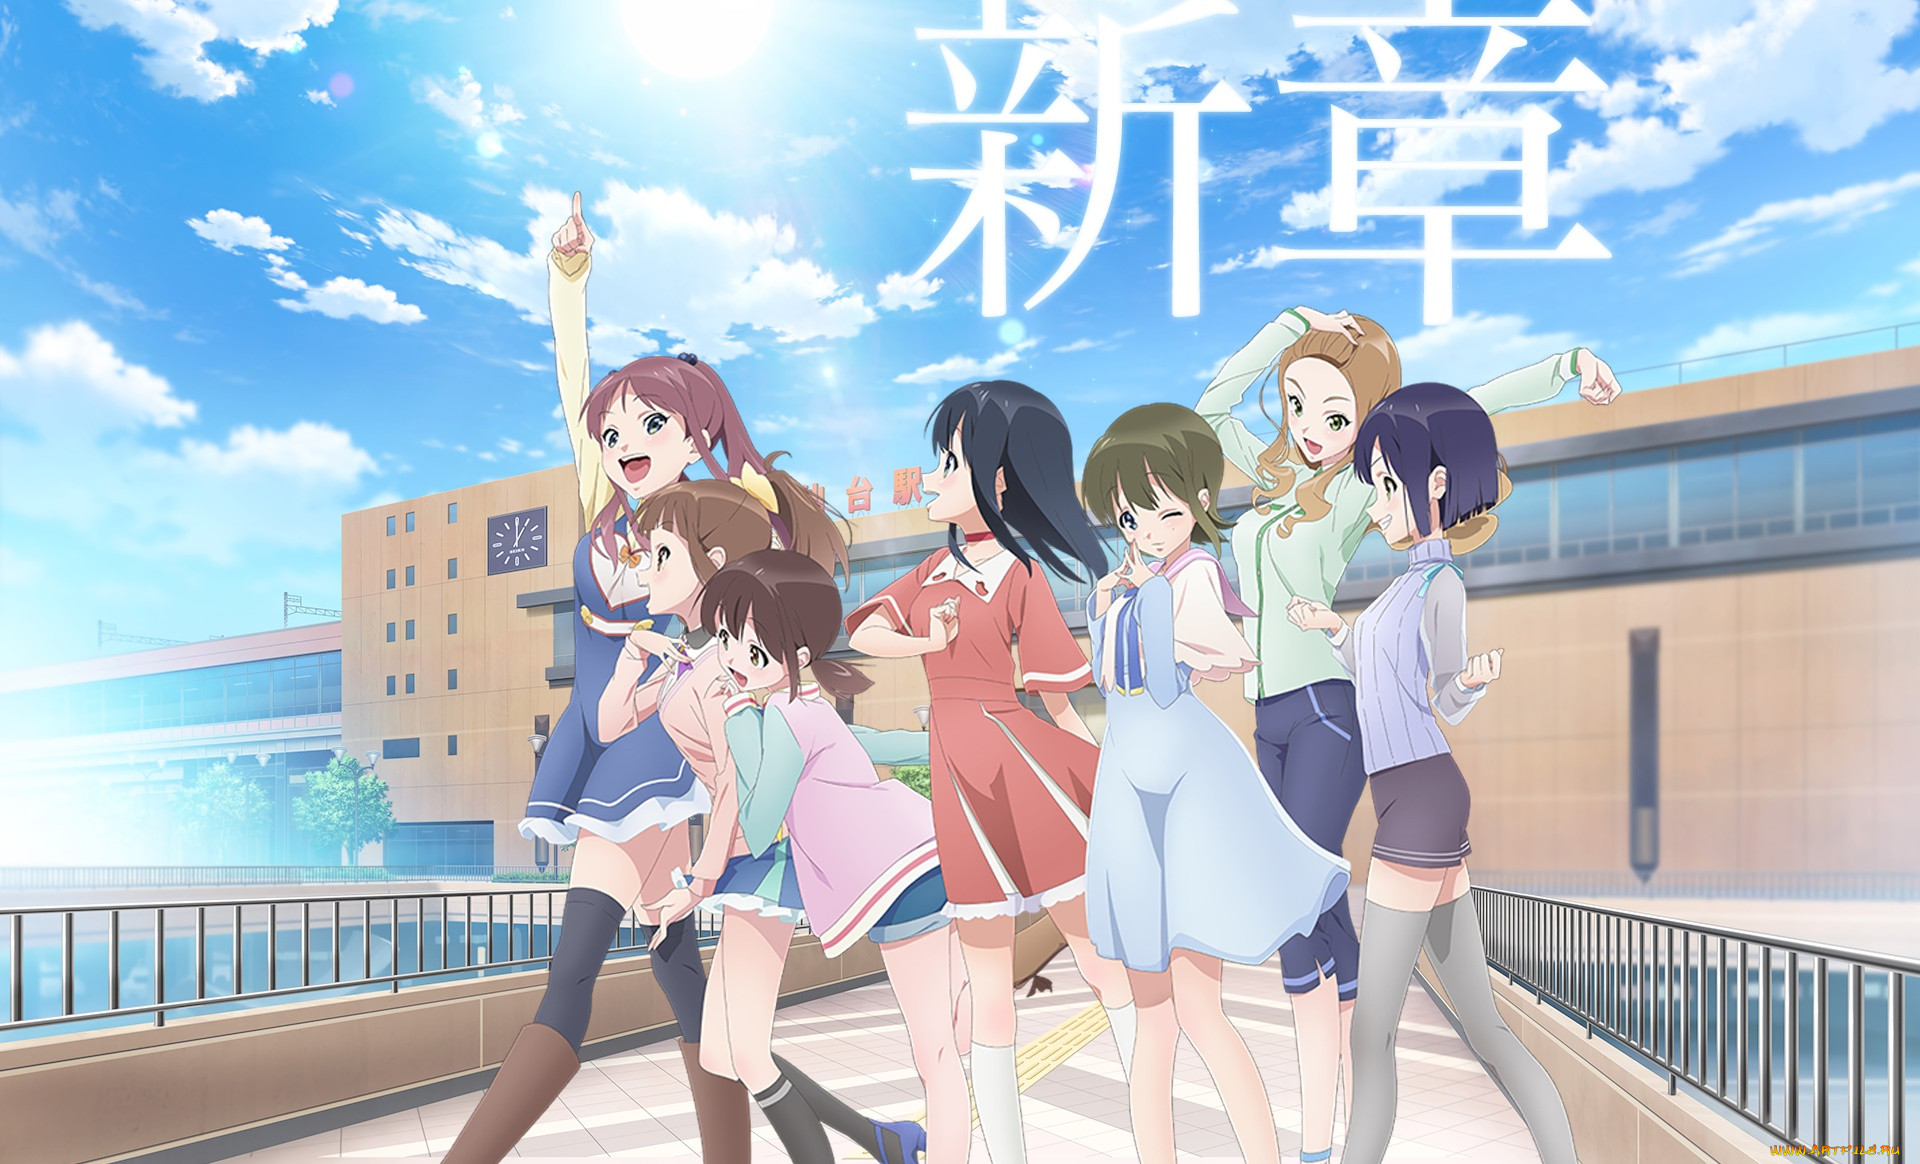 wake up,  girls,  shichi-nin no idol, аниме, unknown,  другое, взгляд, девушки, фон